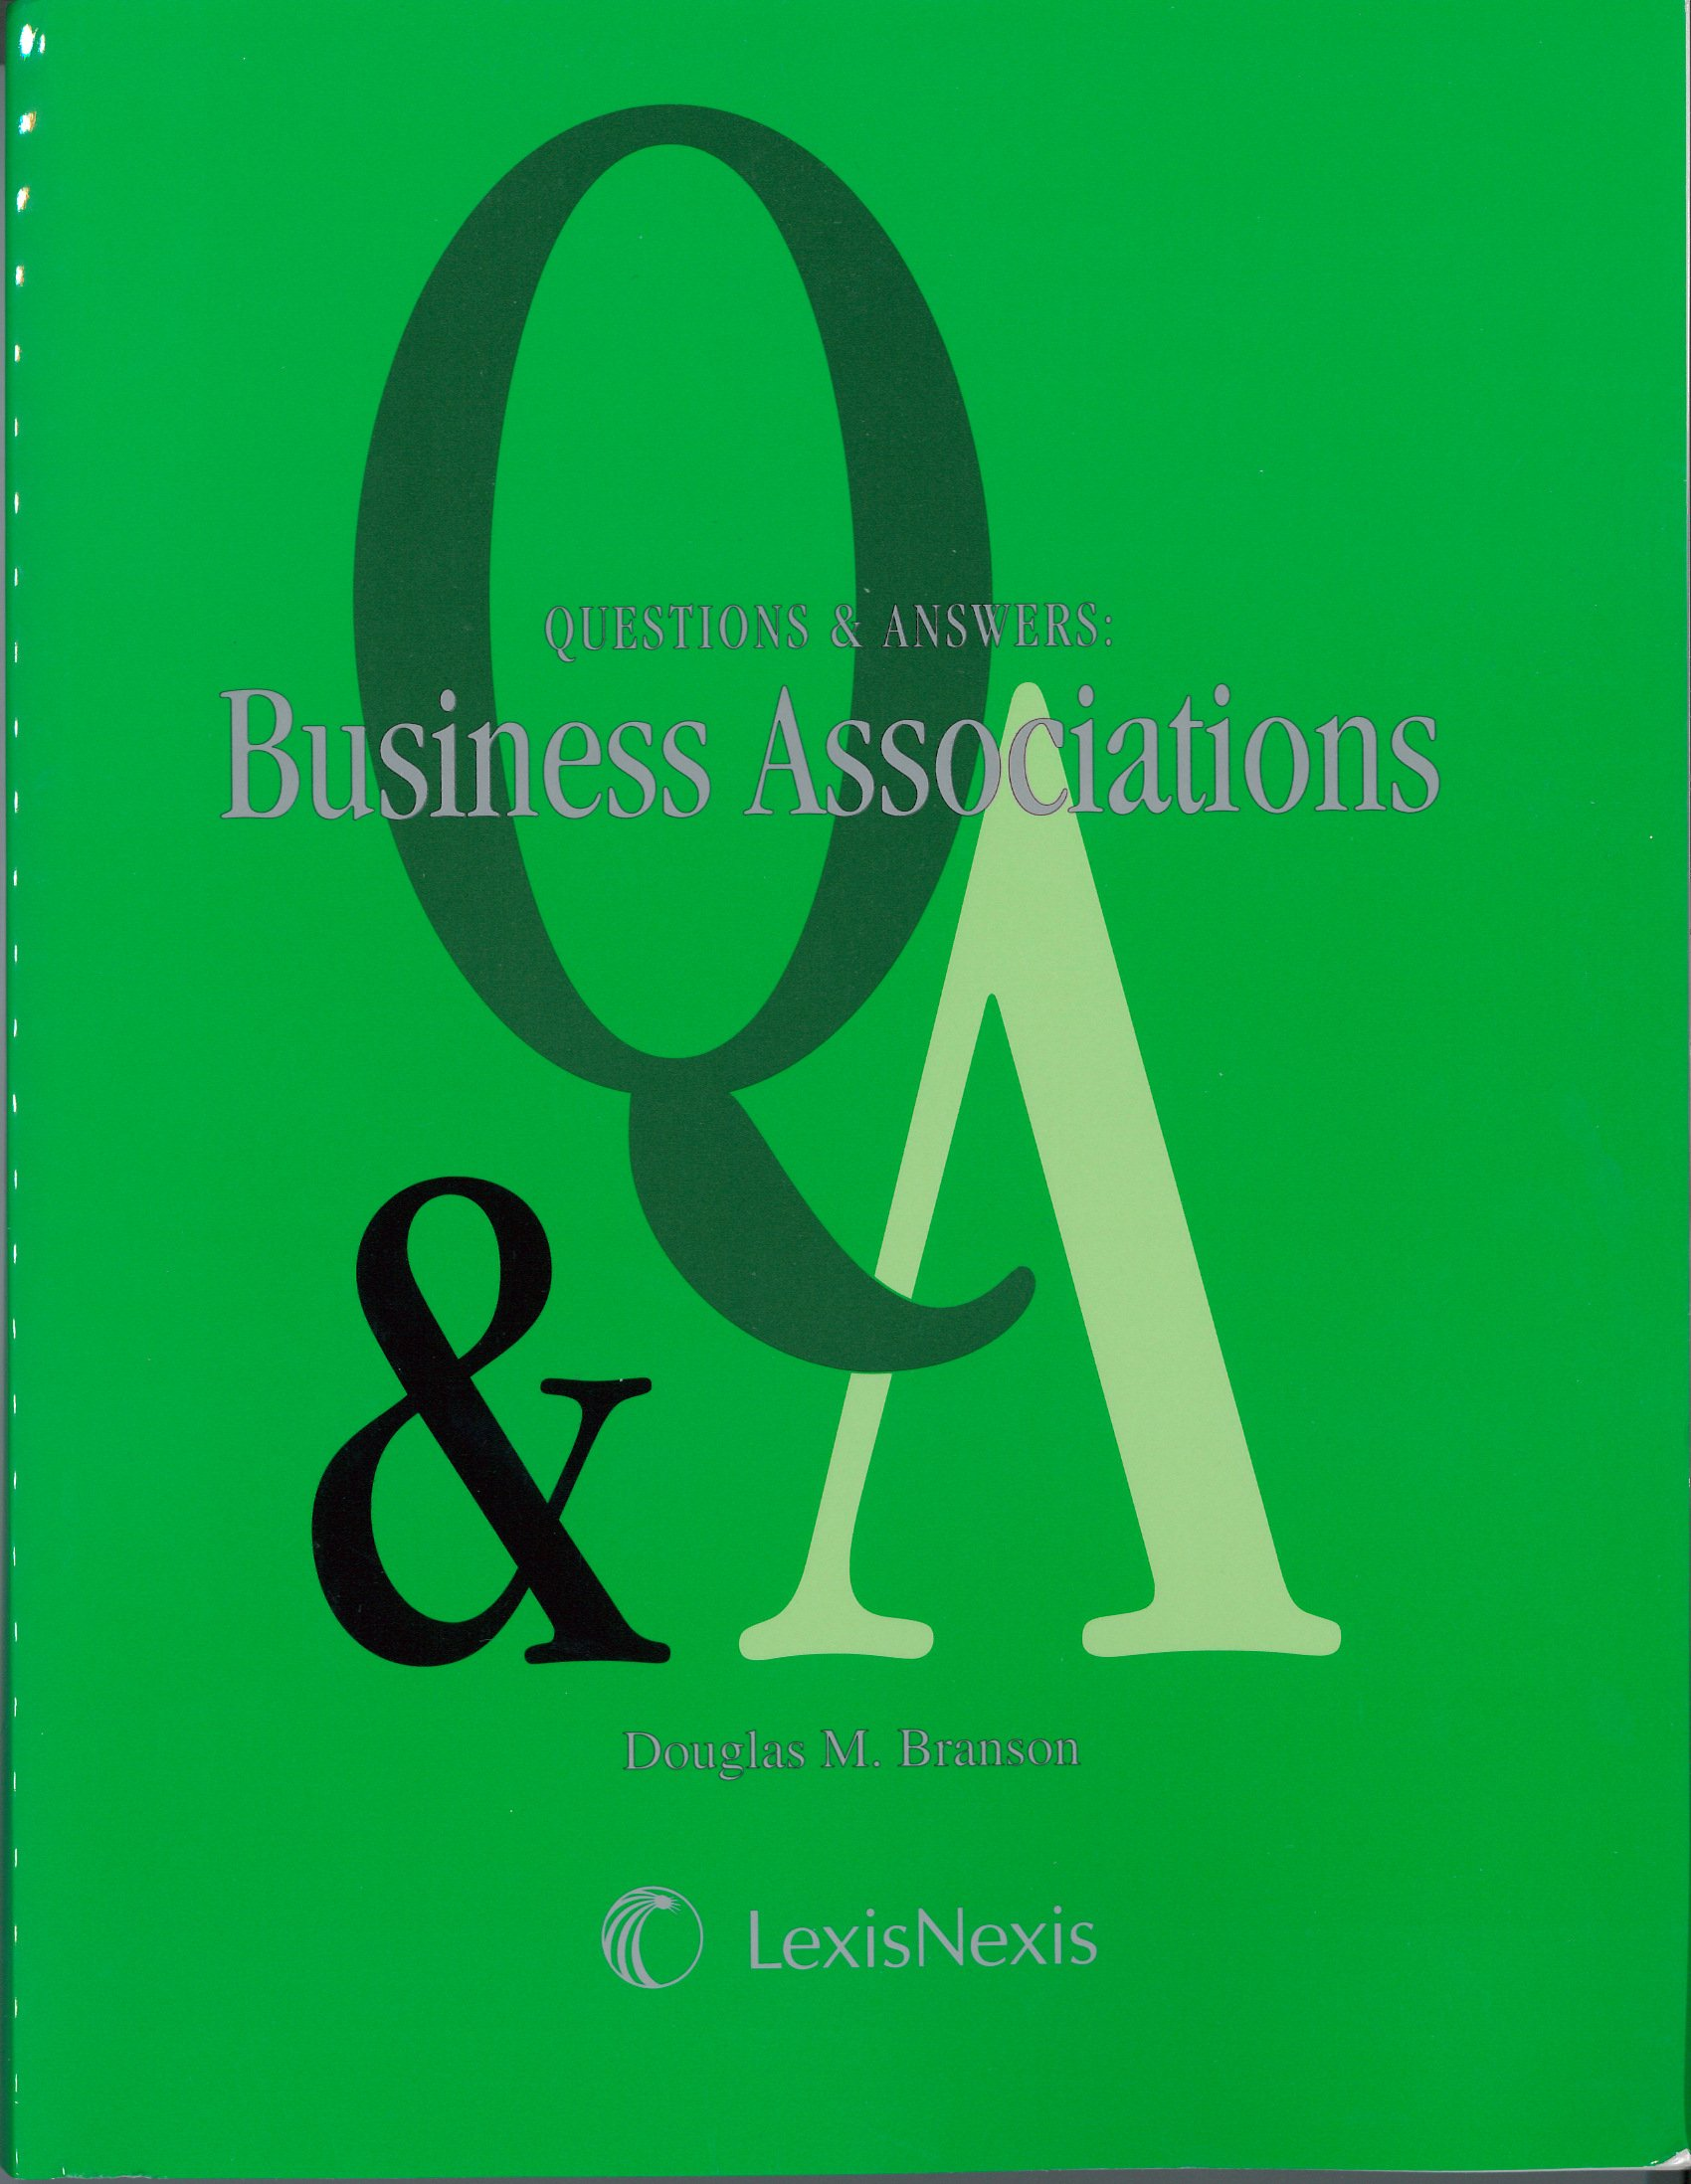 Poster design questions - Questions And Answers Business Associations Douglas M Branson 9780820556581 Amazon Com Books